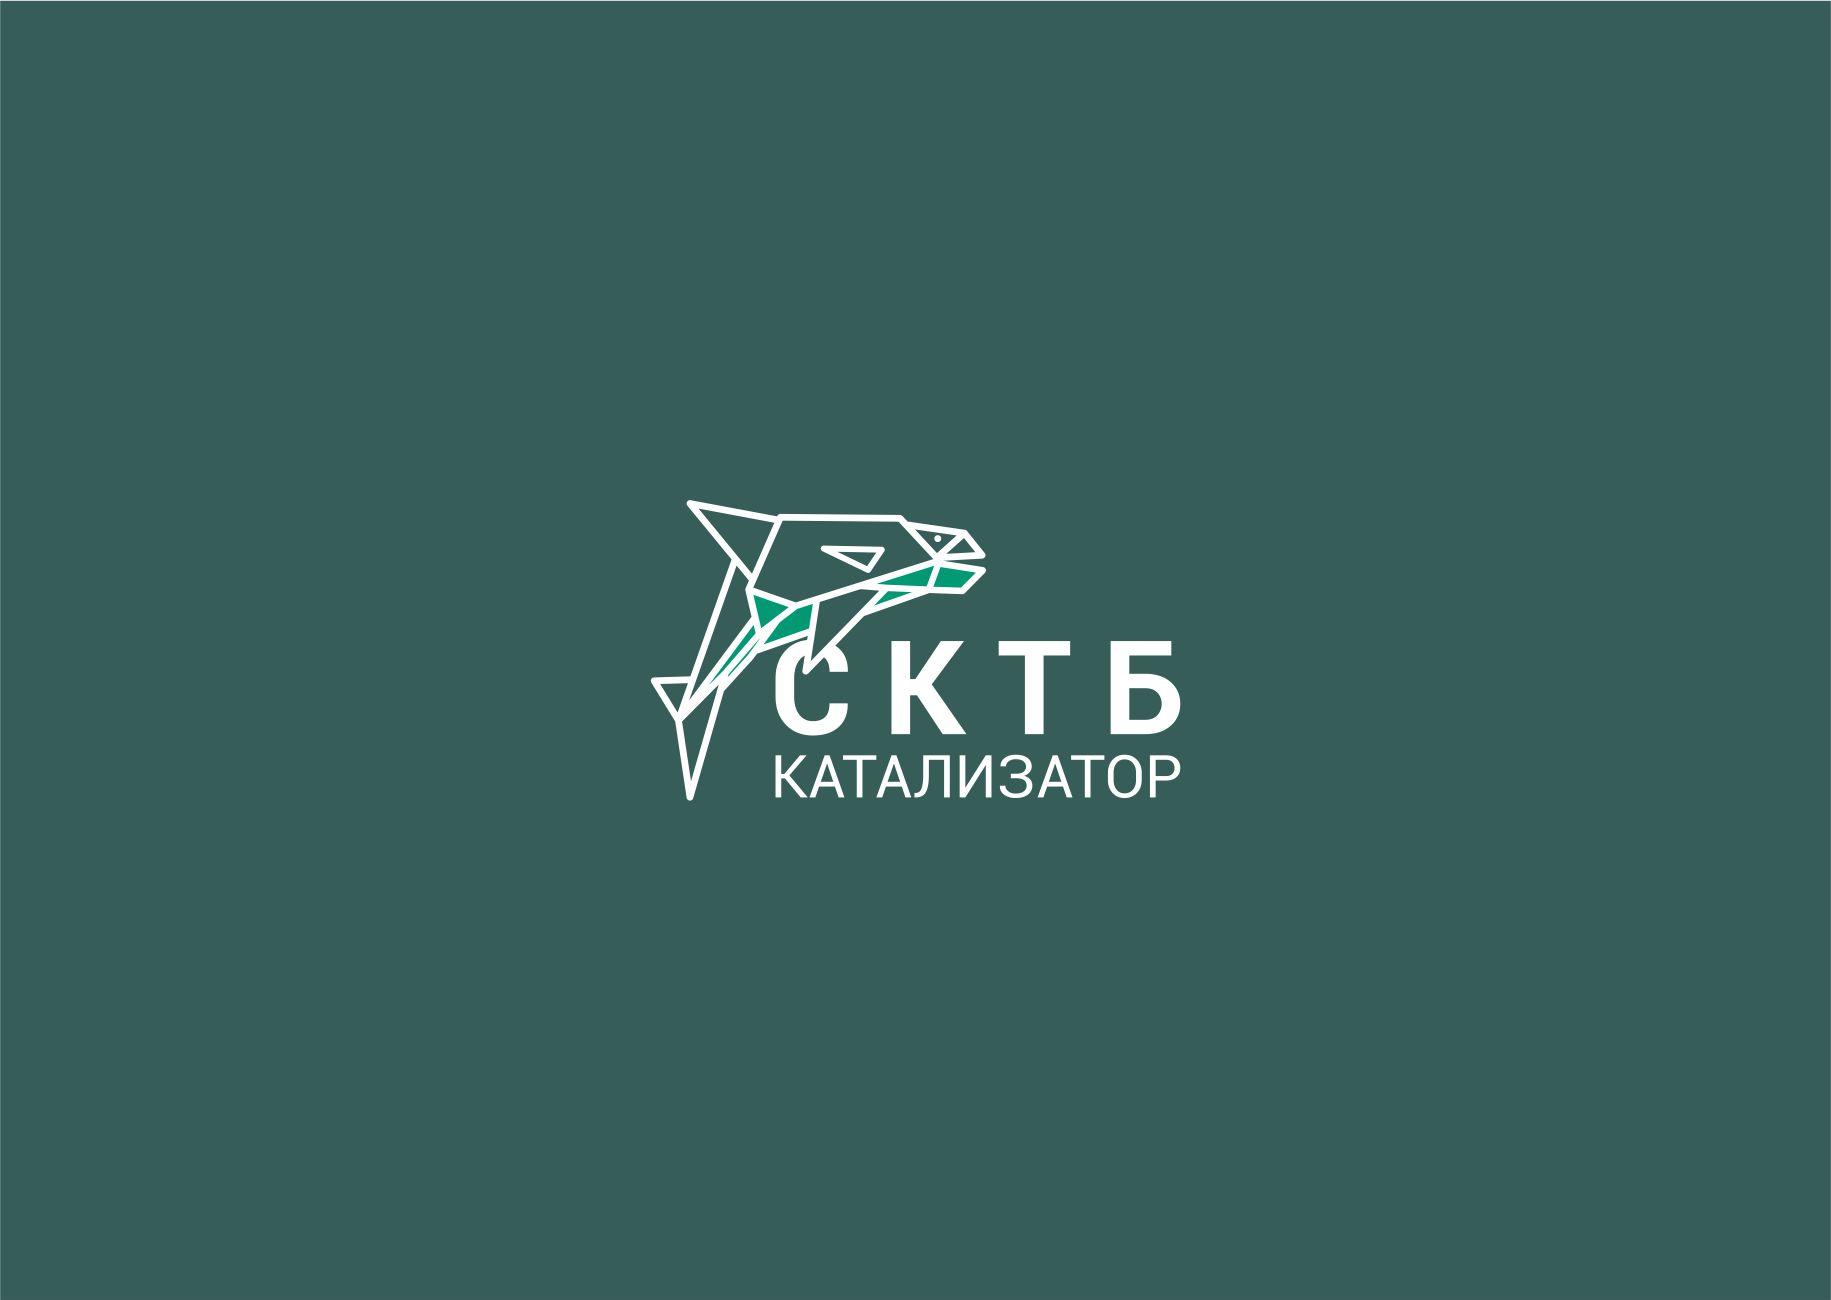 Разработка фирменного символа компании - касатки, НЕ ЛОГОТИП фото f_6965afe53bd39c59.jpg